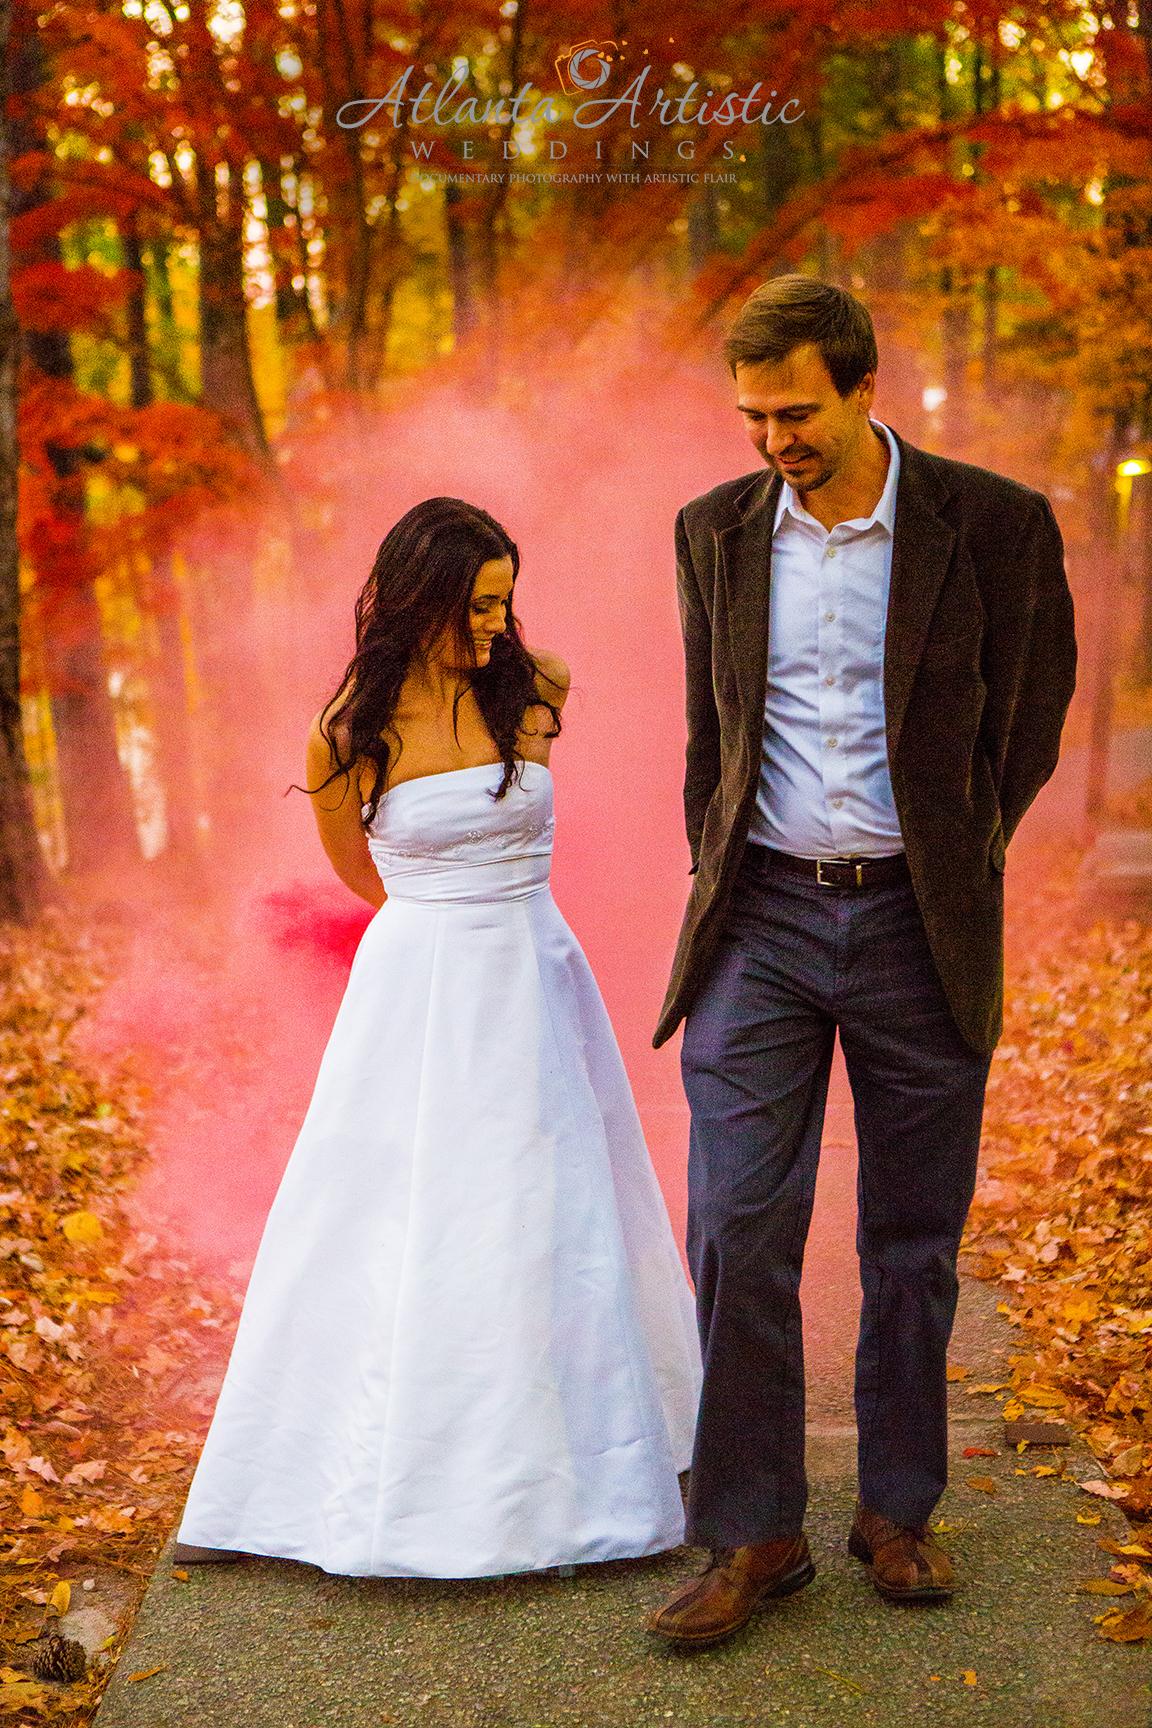 Color Bomb fall wedding photo by the Atlanta Wedding photographers at AtlantaArtisticWeddings